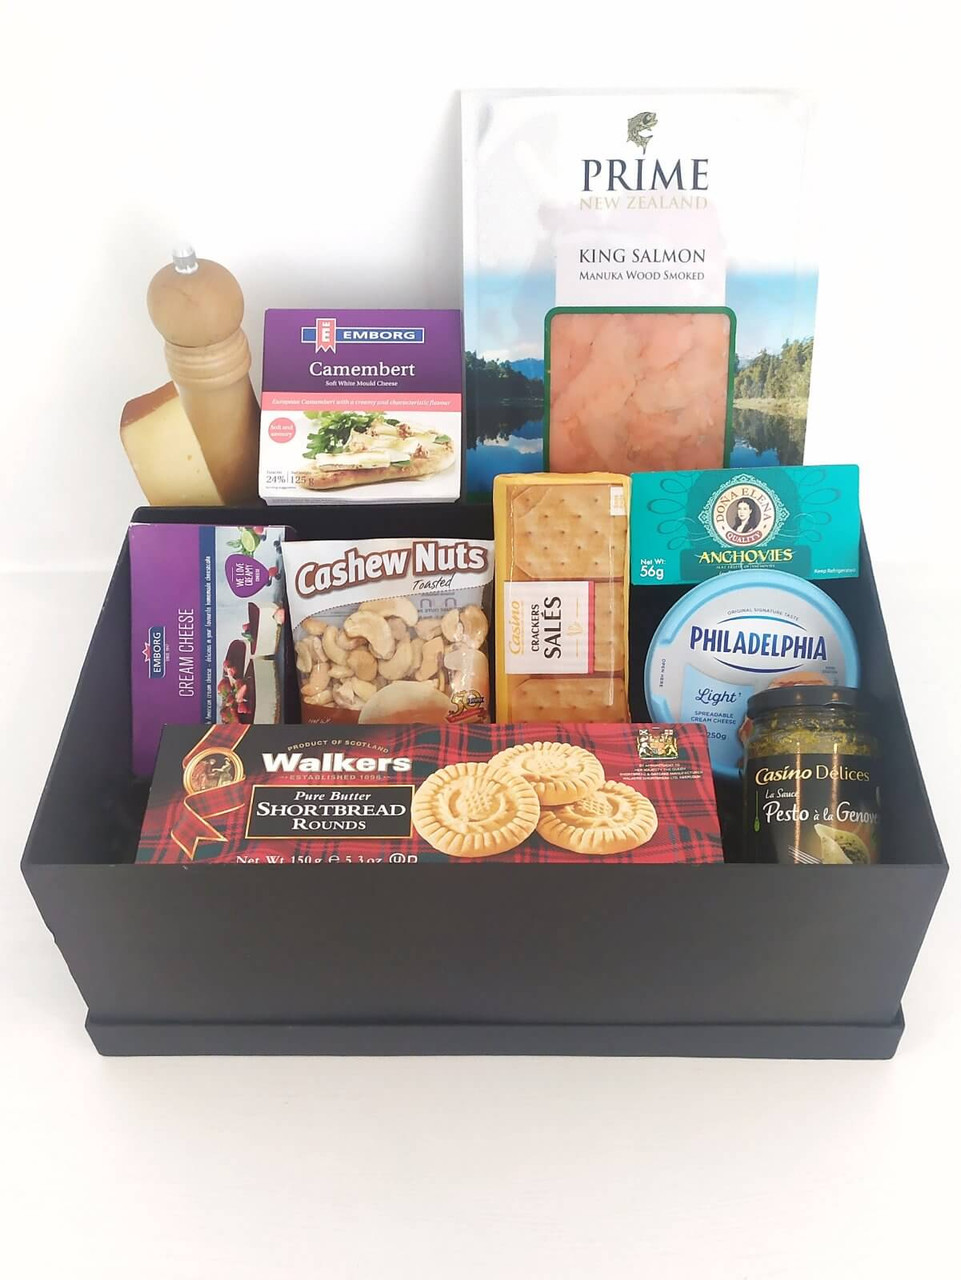 Hors d'oeuvre Gourmet Gift Box